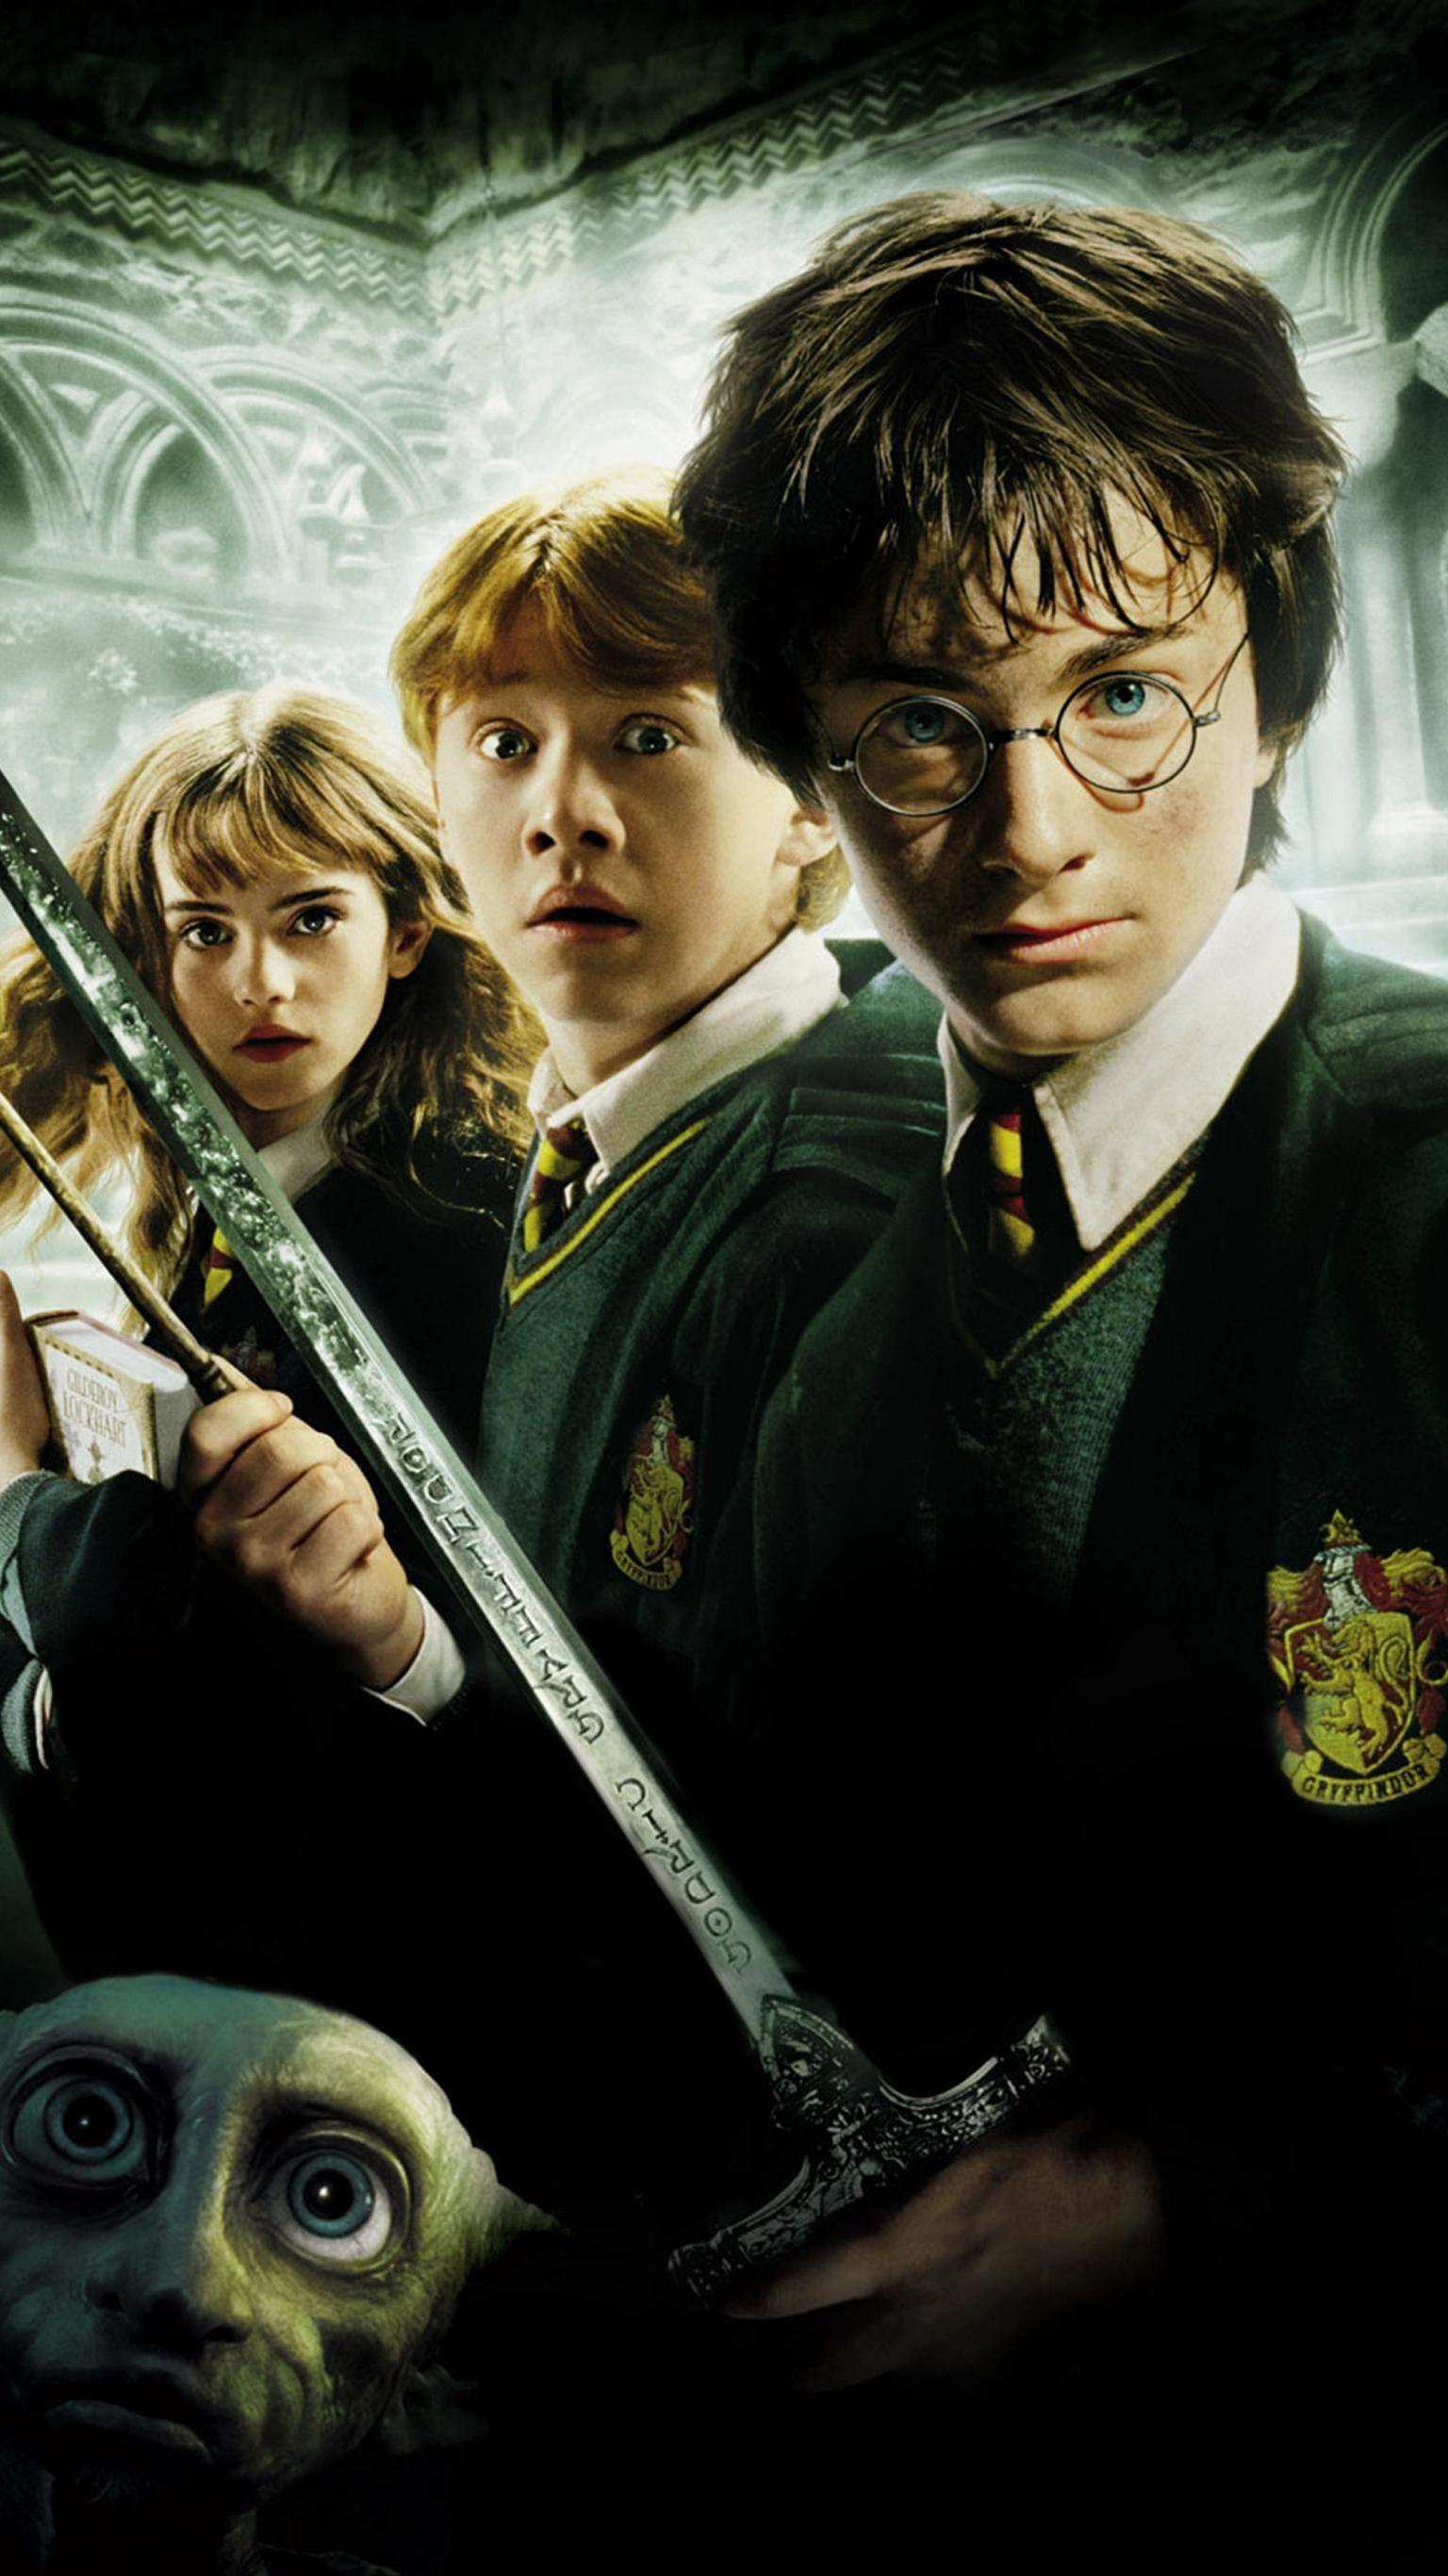 Harry Potter And The Chamber Of Secrets 2002 Phone Wallpaper Moviemania Harrypotterwallpaper Filmes Harry Potter Filme Assistir Filmes Gratis